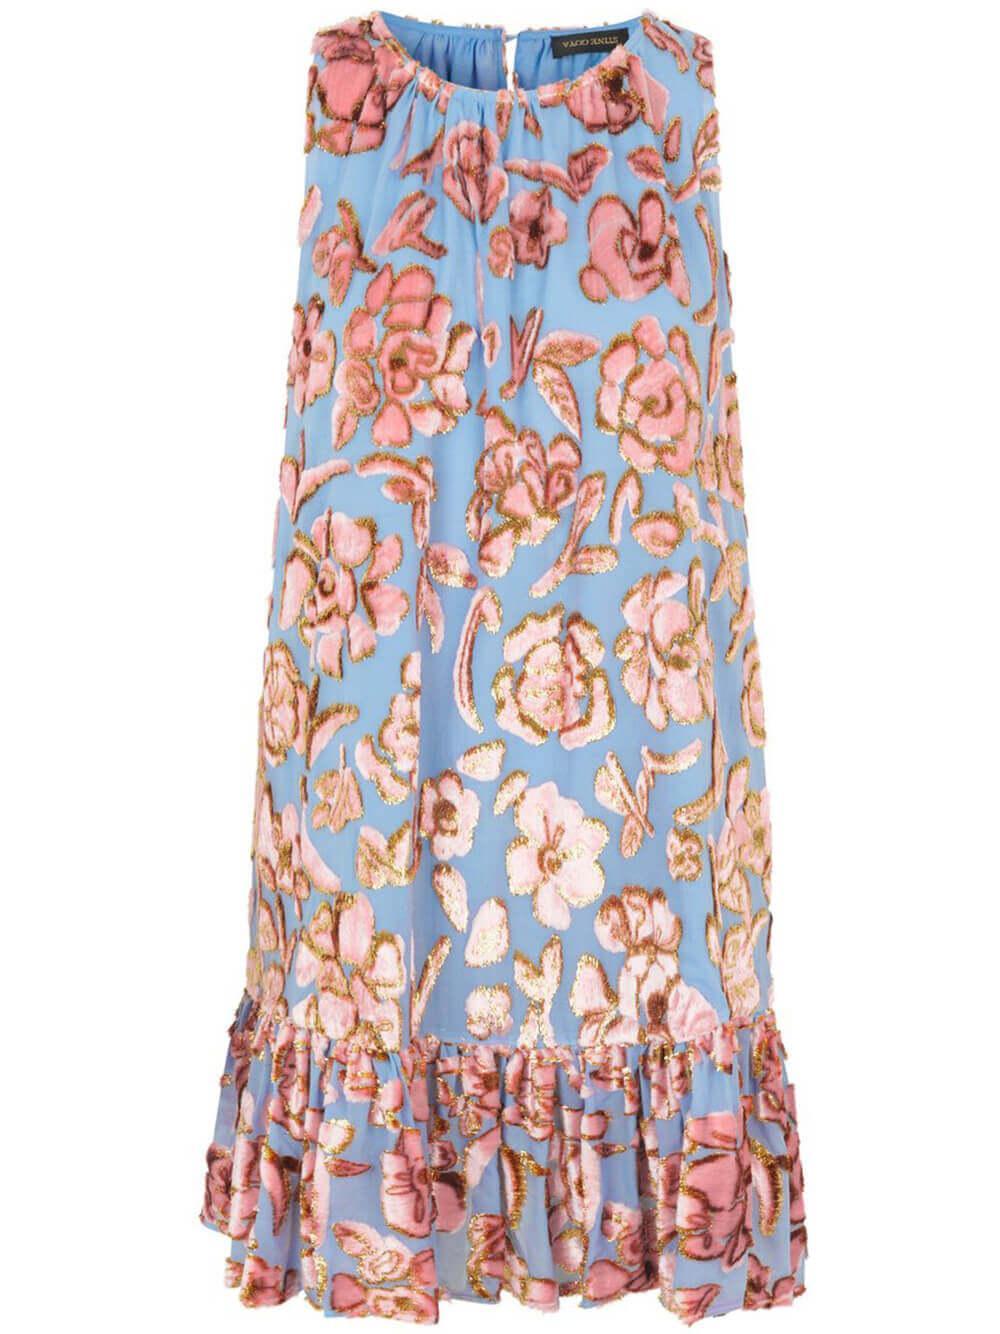 Kenna Dress